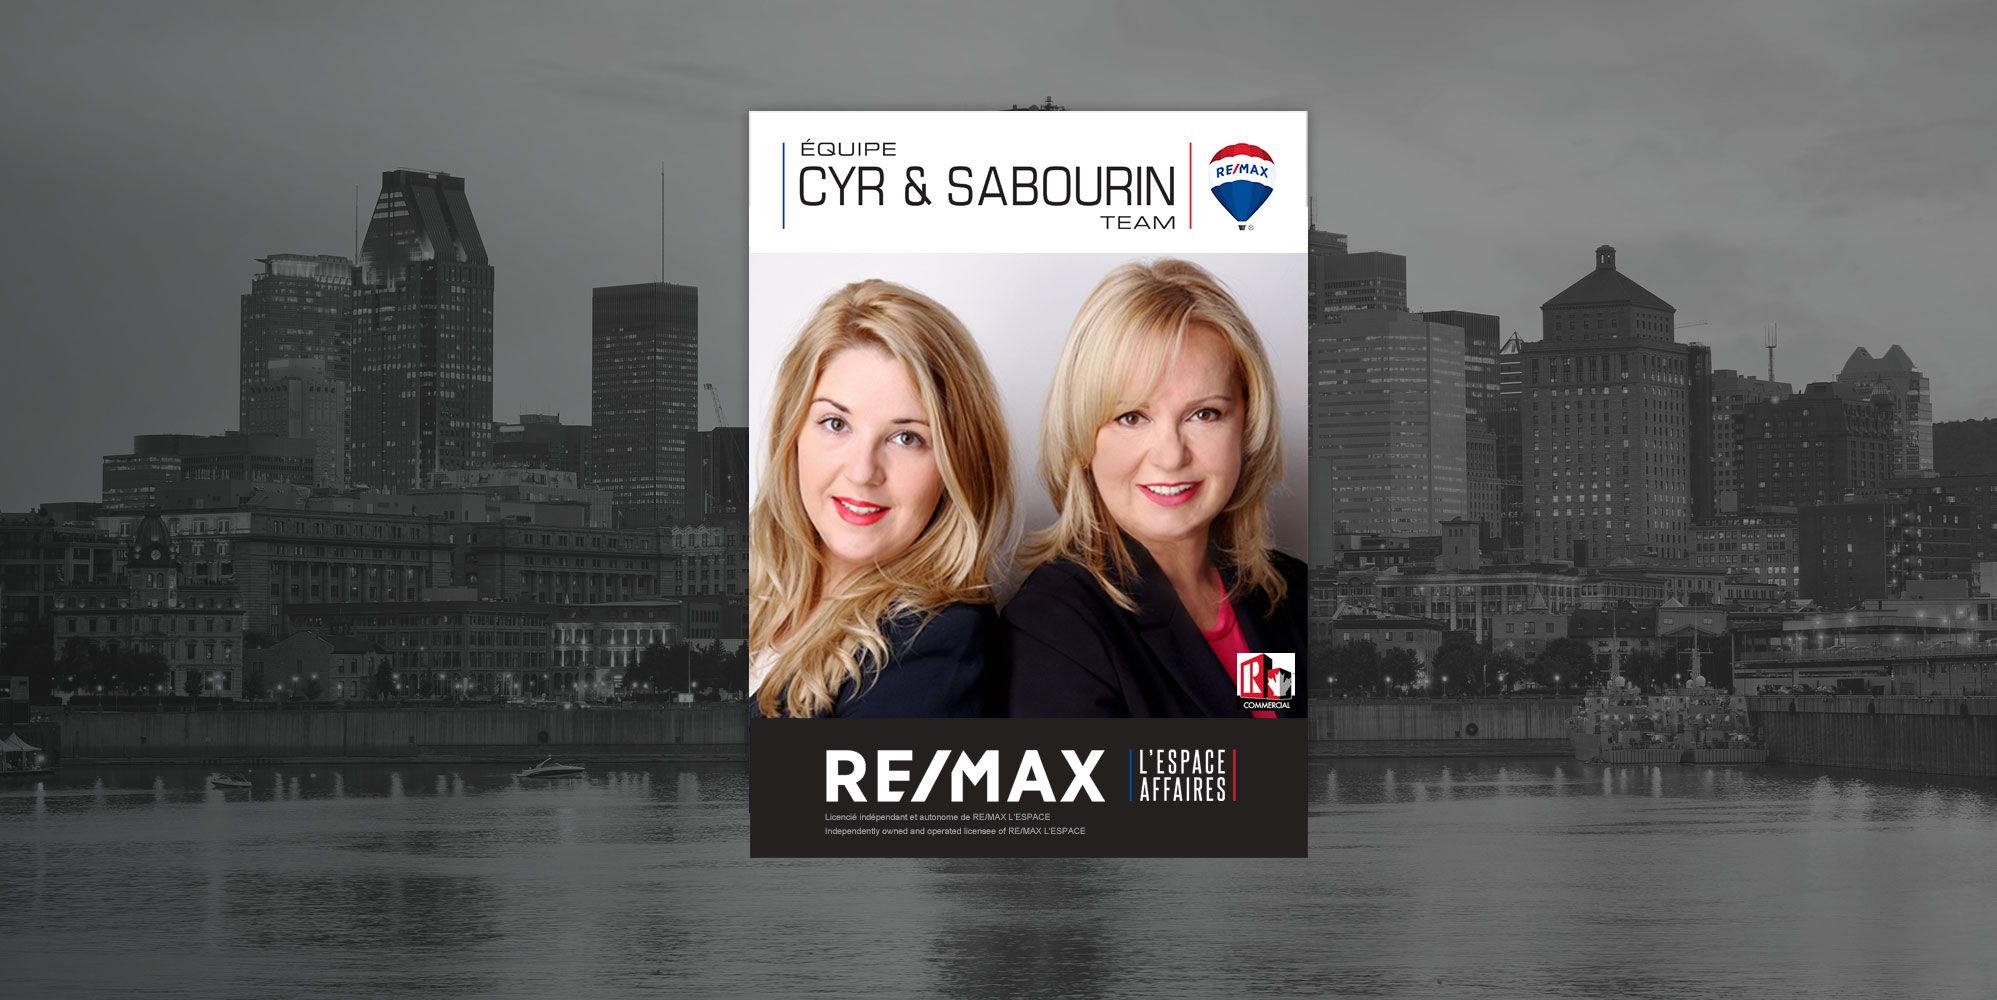 Équipe Cyr & Sabourin